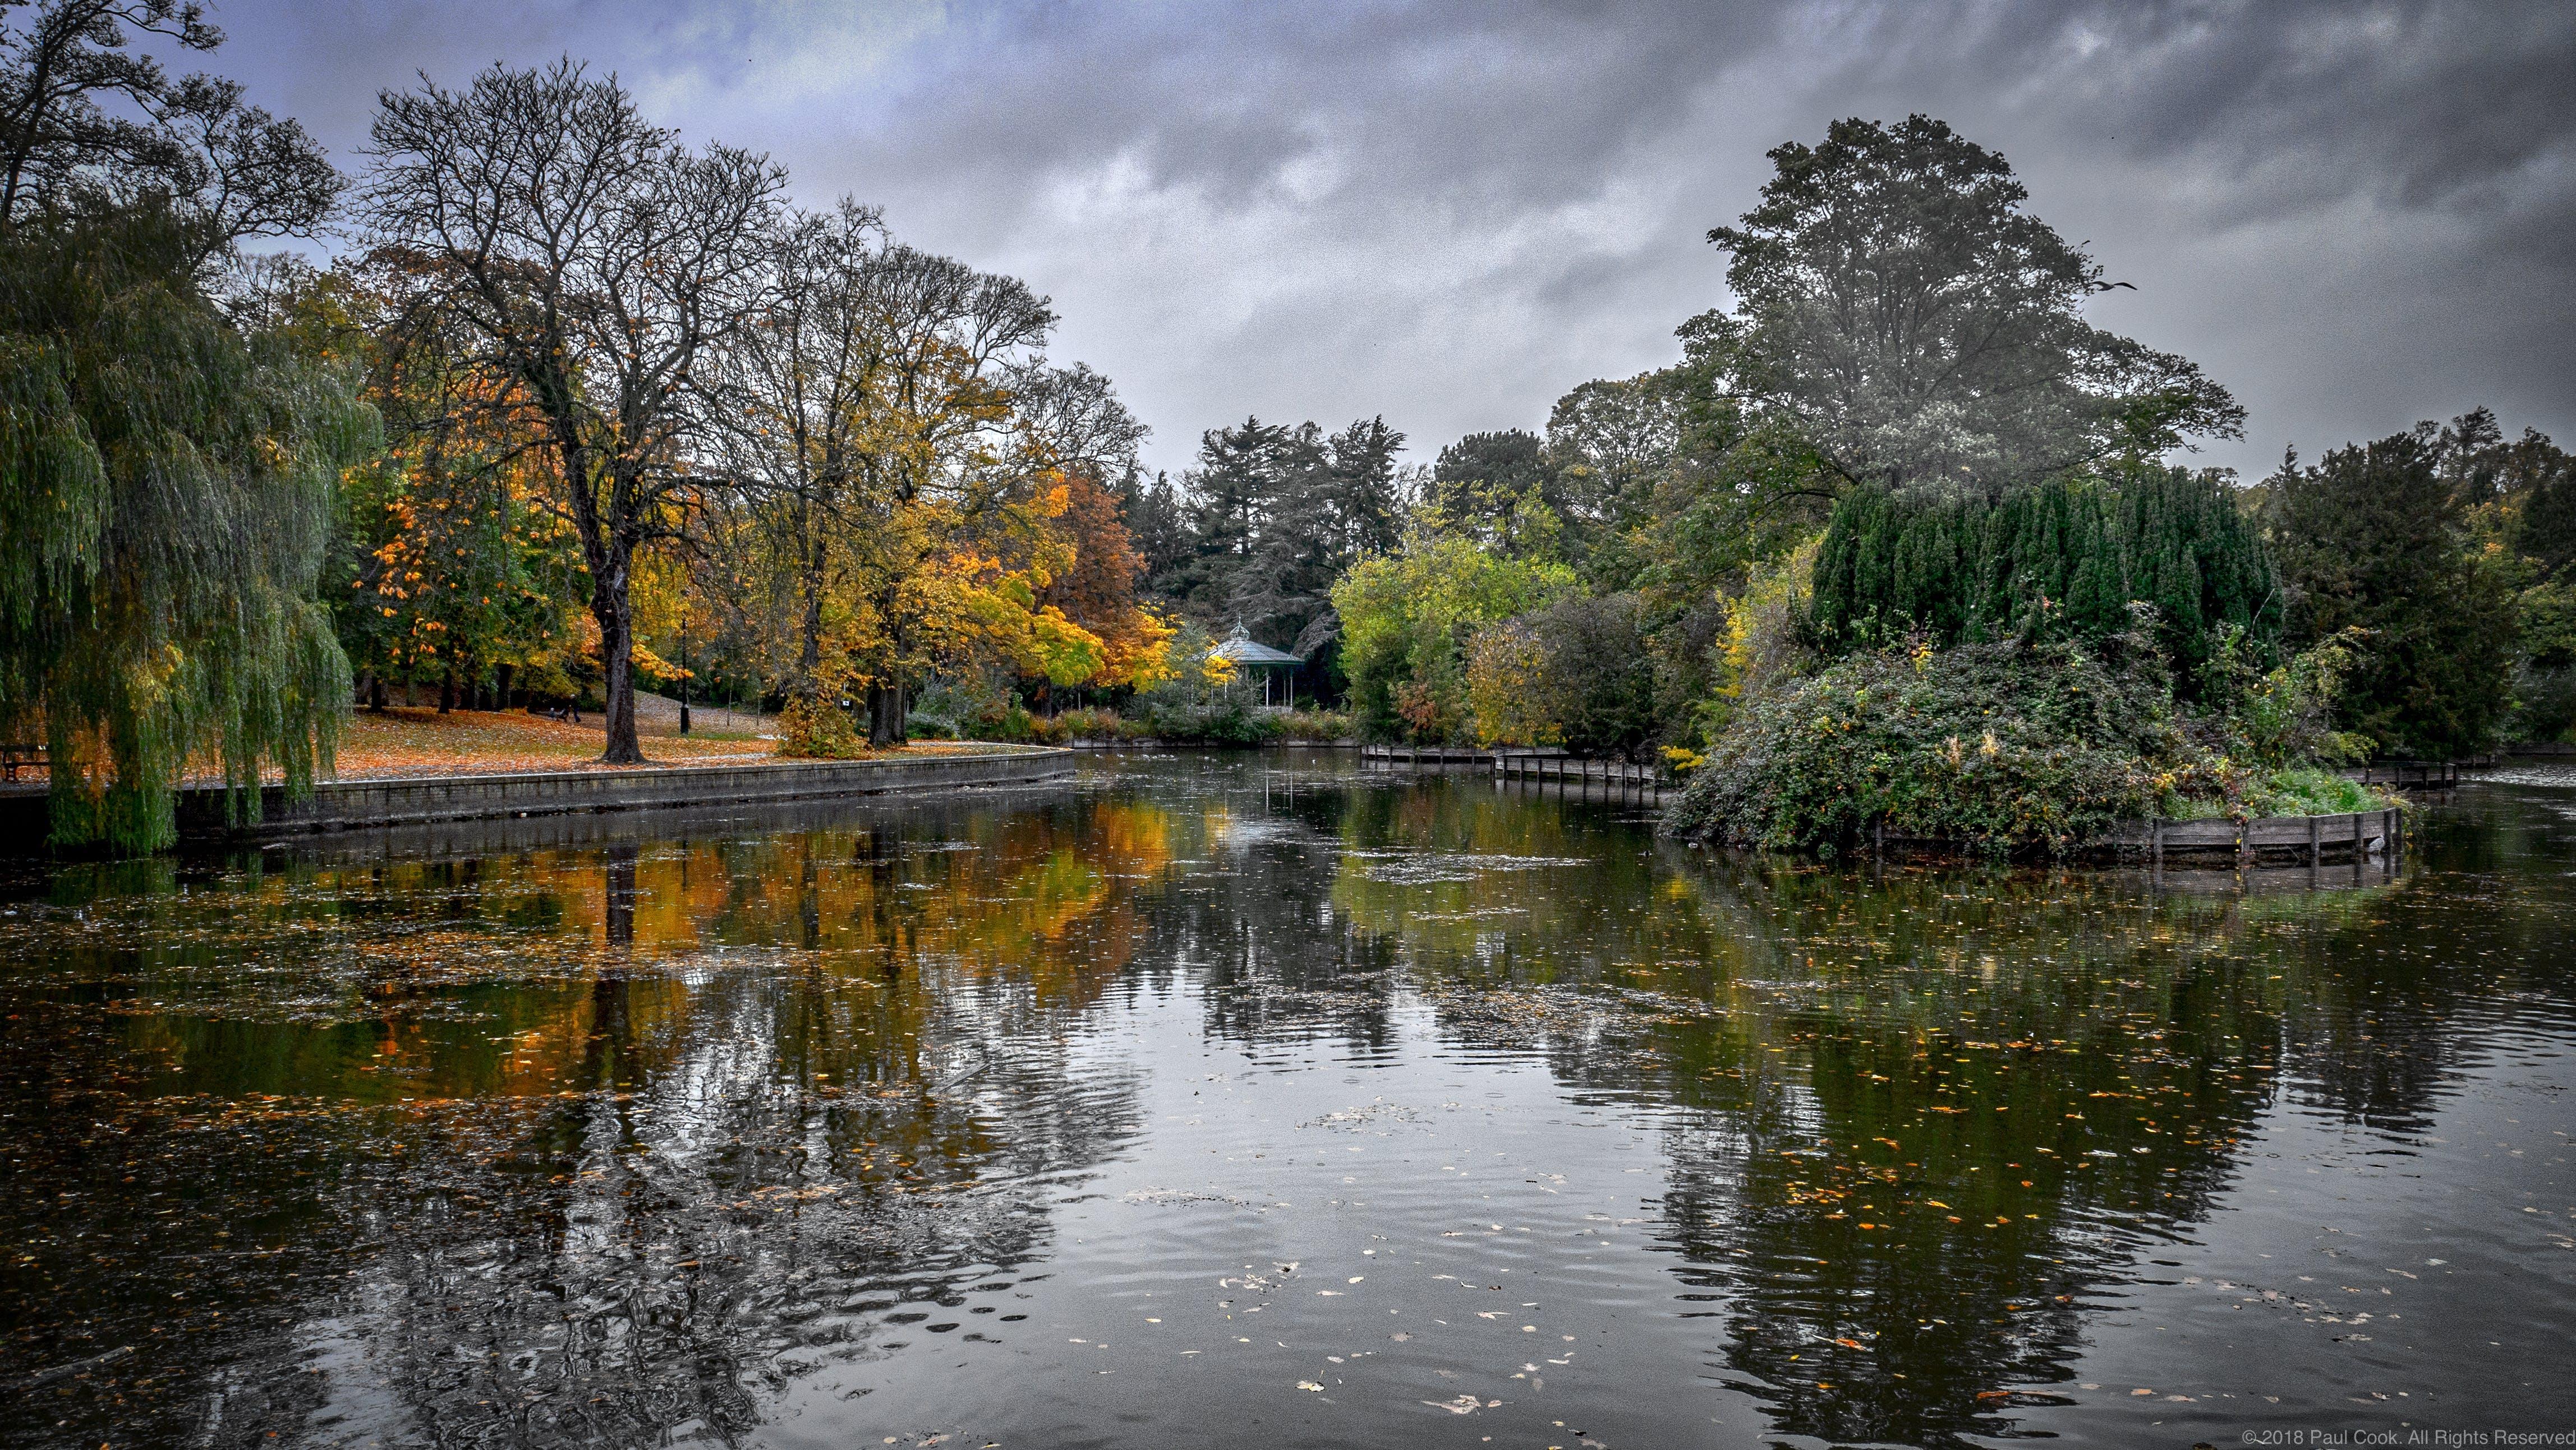 Free stock photo of Darlington, park, pond, reflections